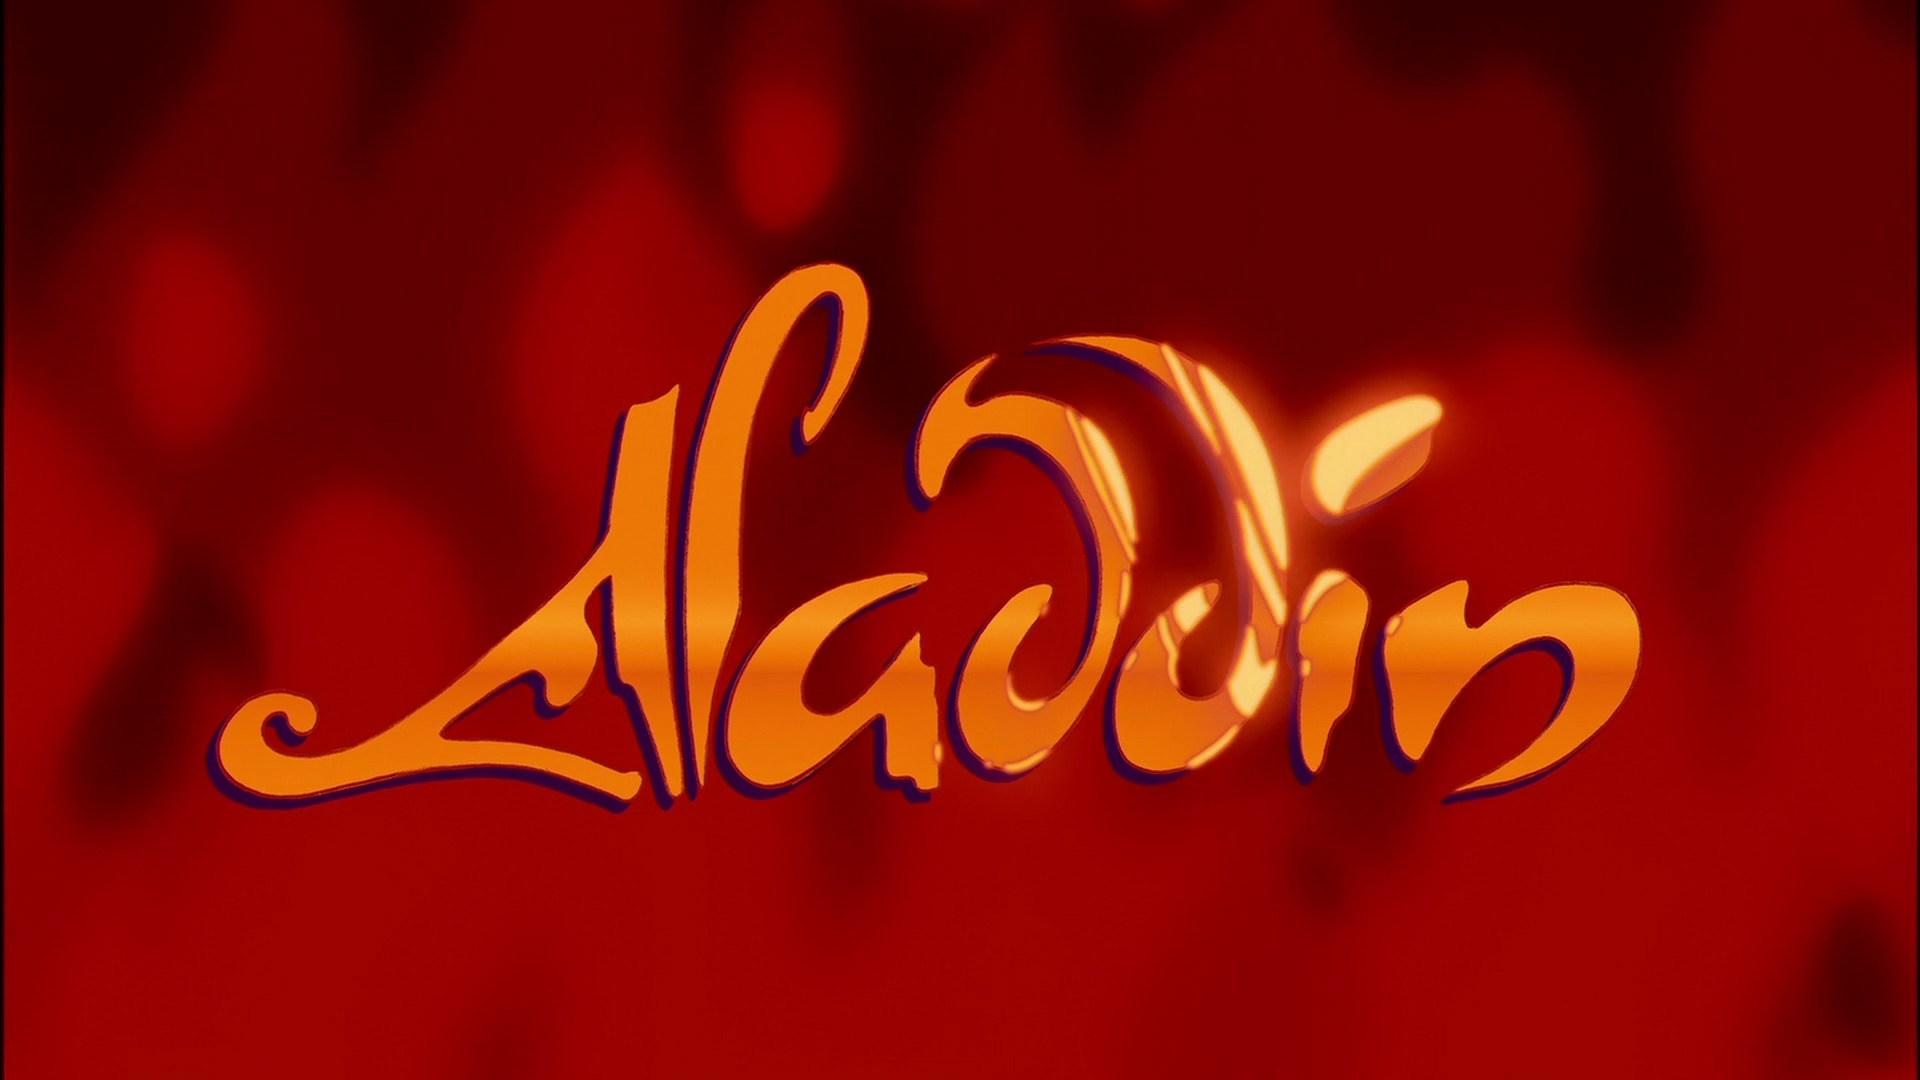 Aladdin (Disneys Svenska) (@cavemodeshake) Cover Image